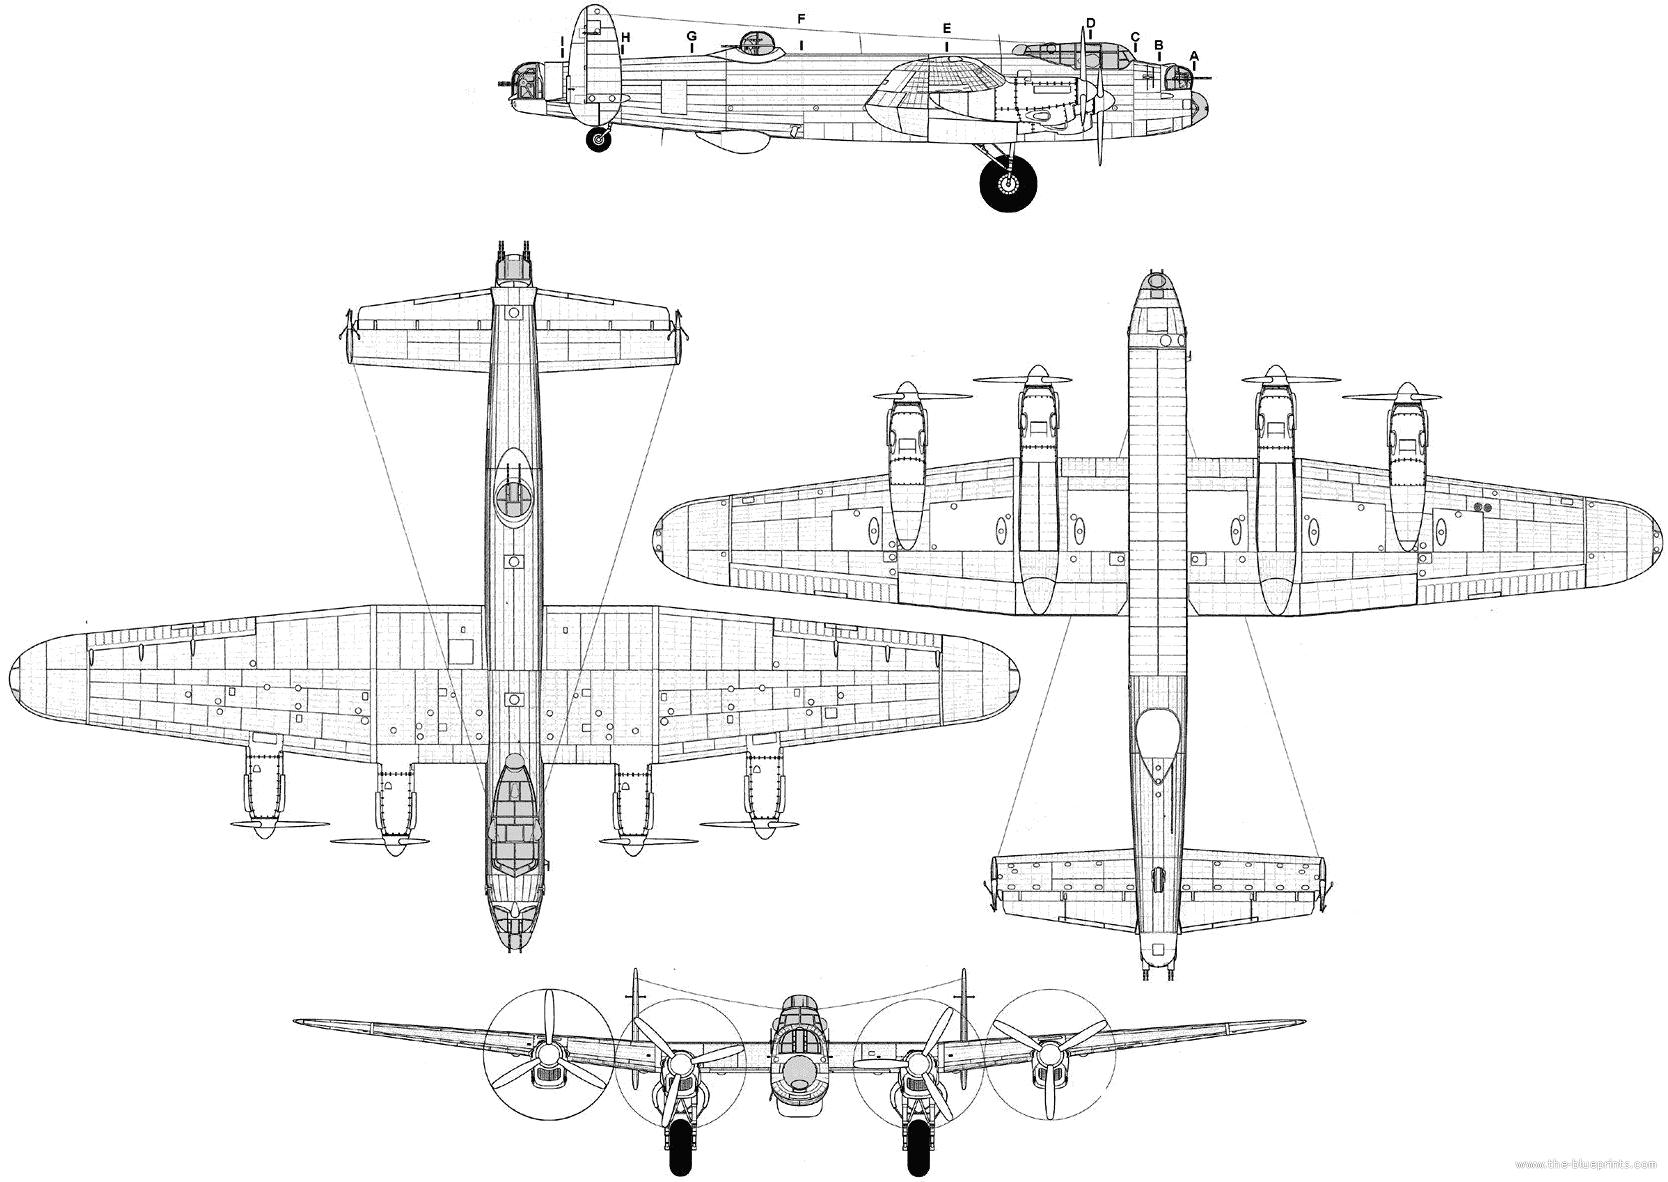 Blueprints Gt Ww2 Airplanes Gt Avro Gt Avro 683 Lancaster B 3